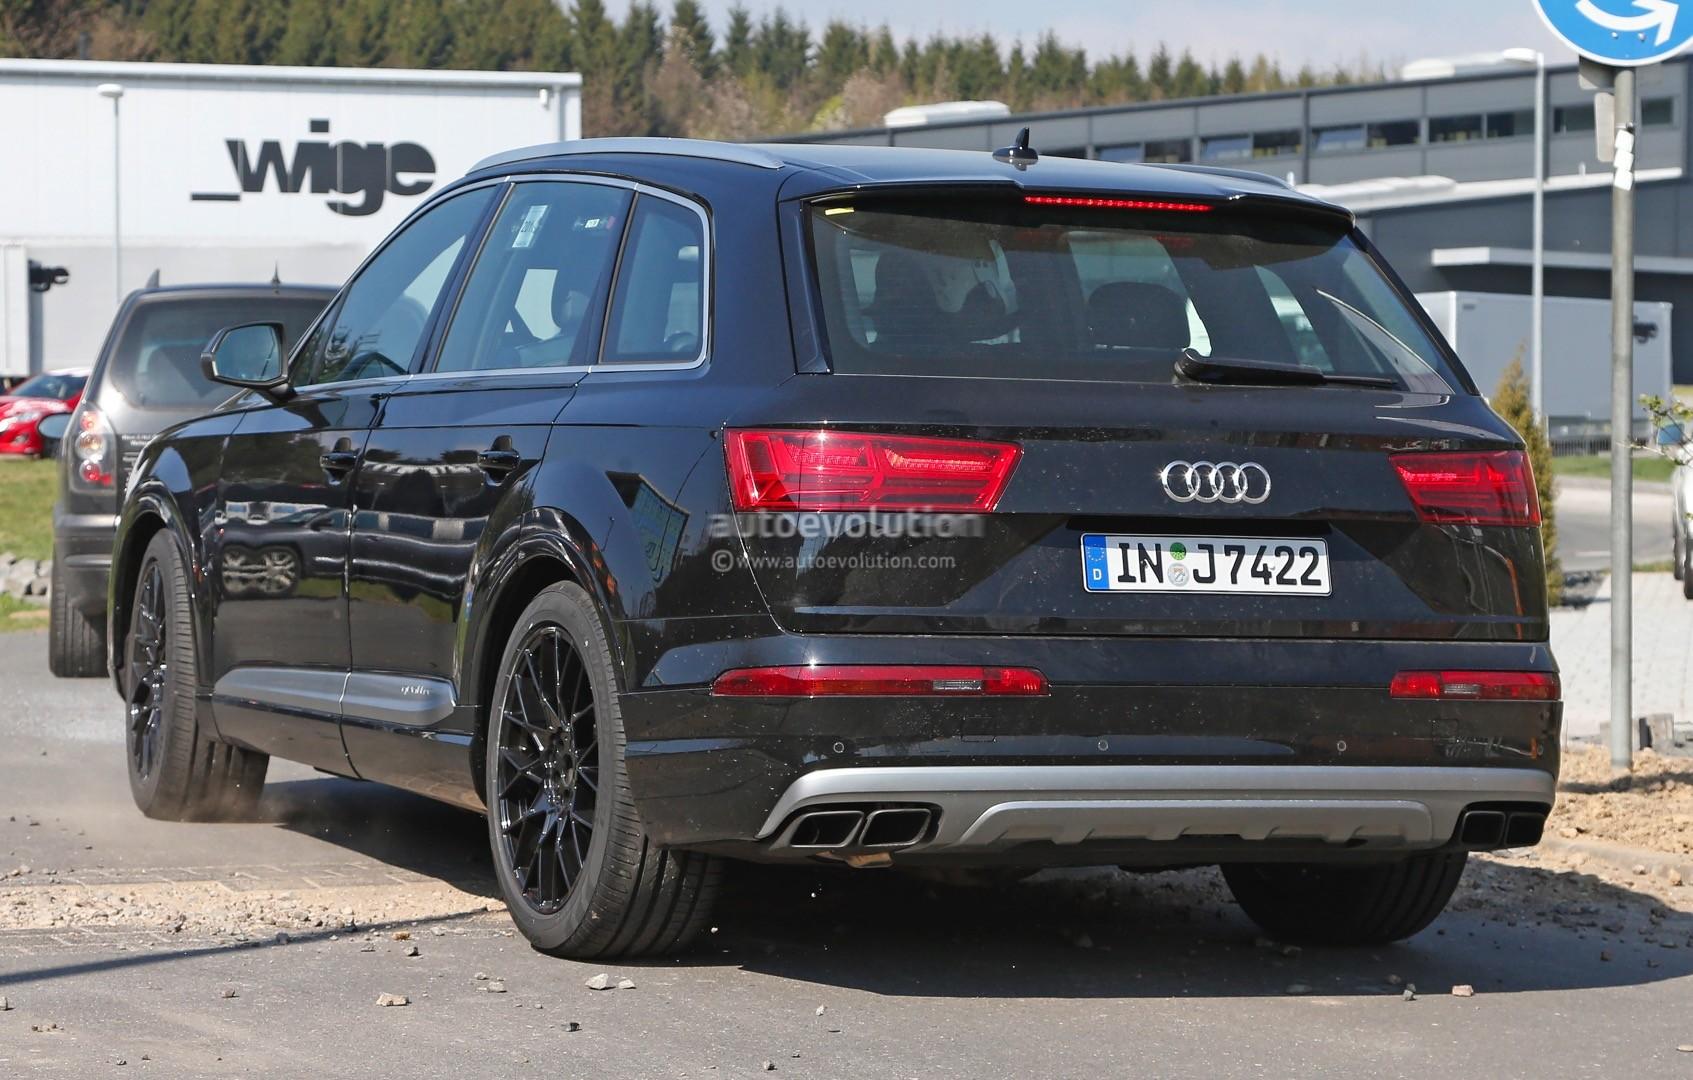 2016 Audi SQ7 Revealed Bare Naked in Fresh Spyshots - autoevolution